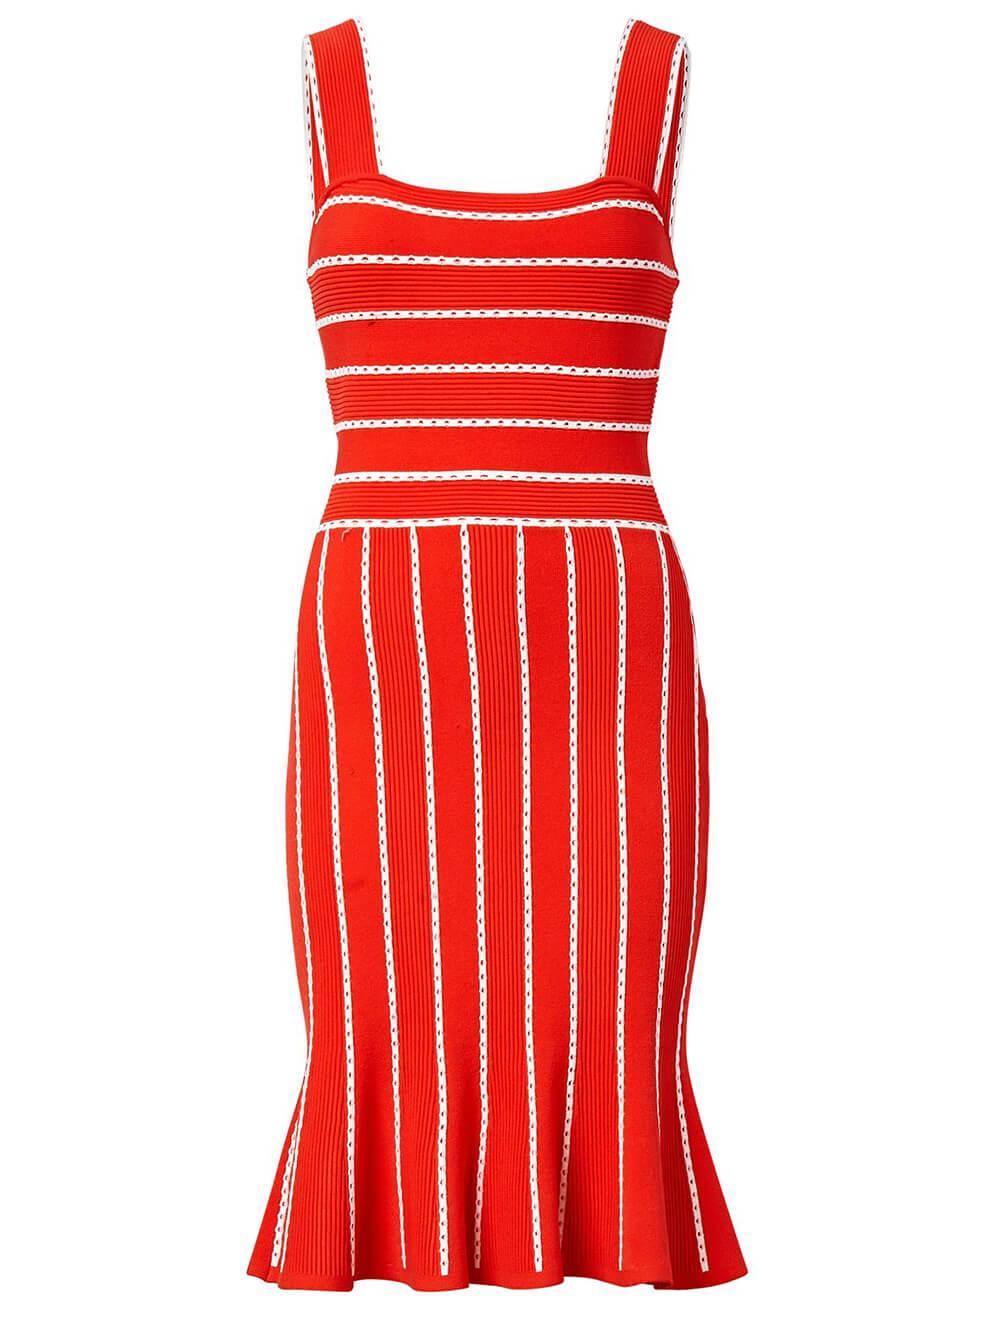 Biolor Striped Knit Dress